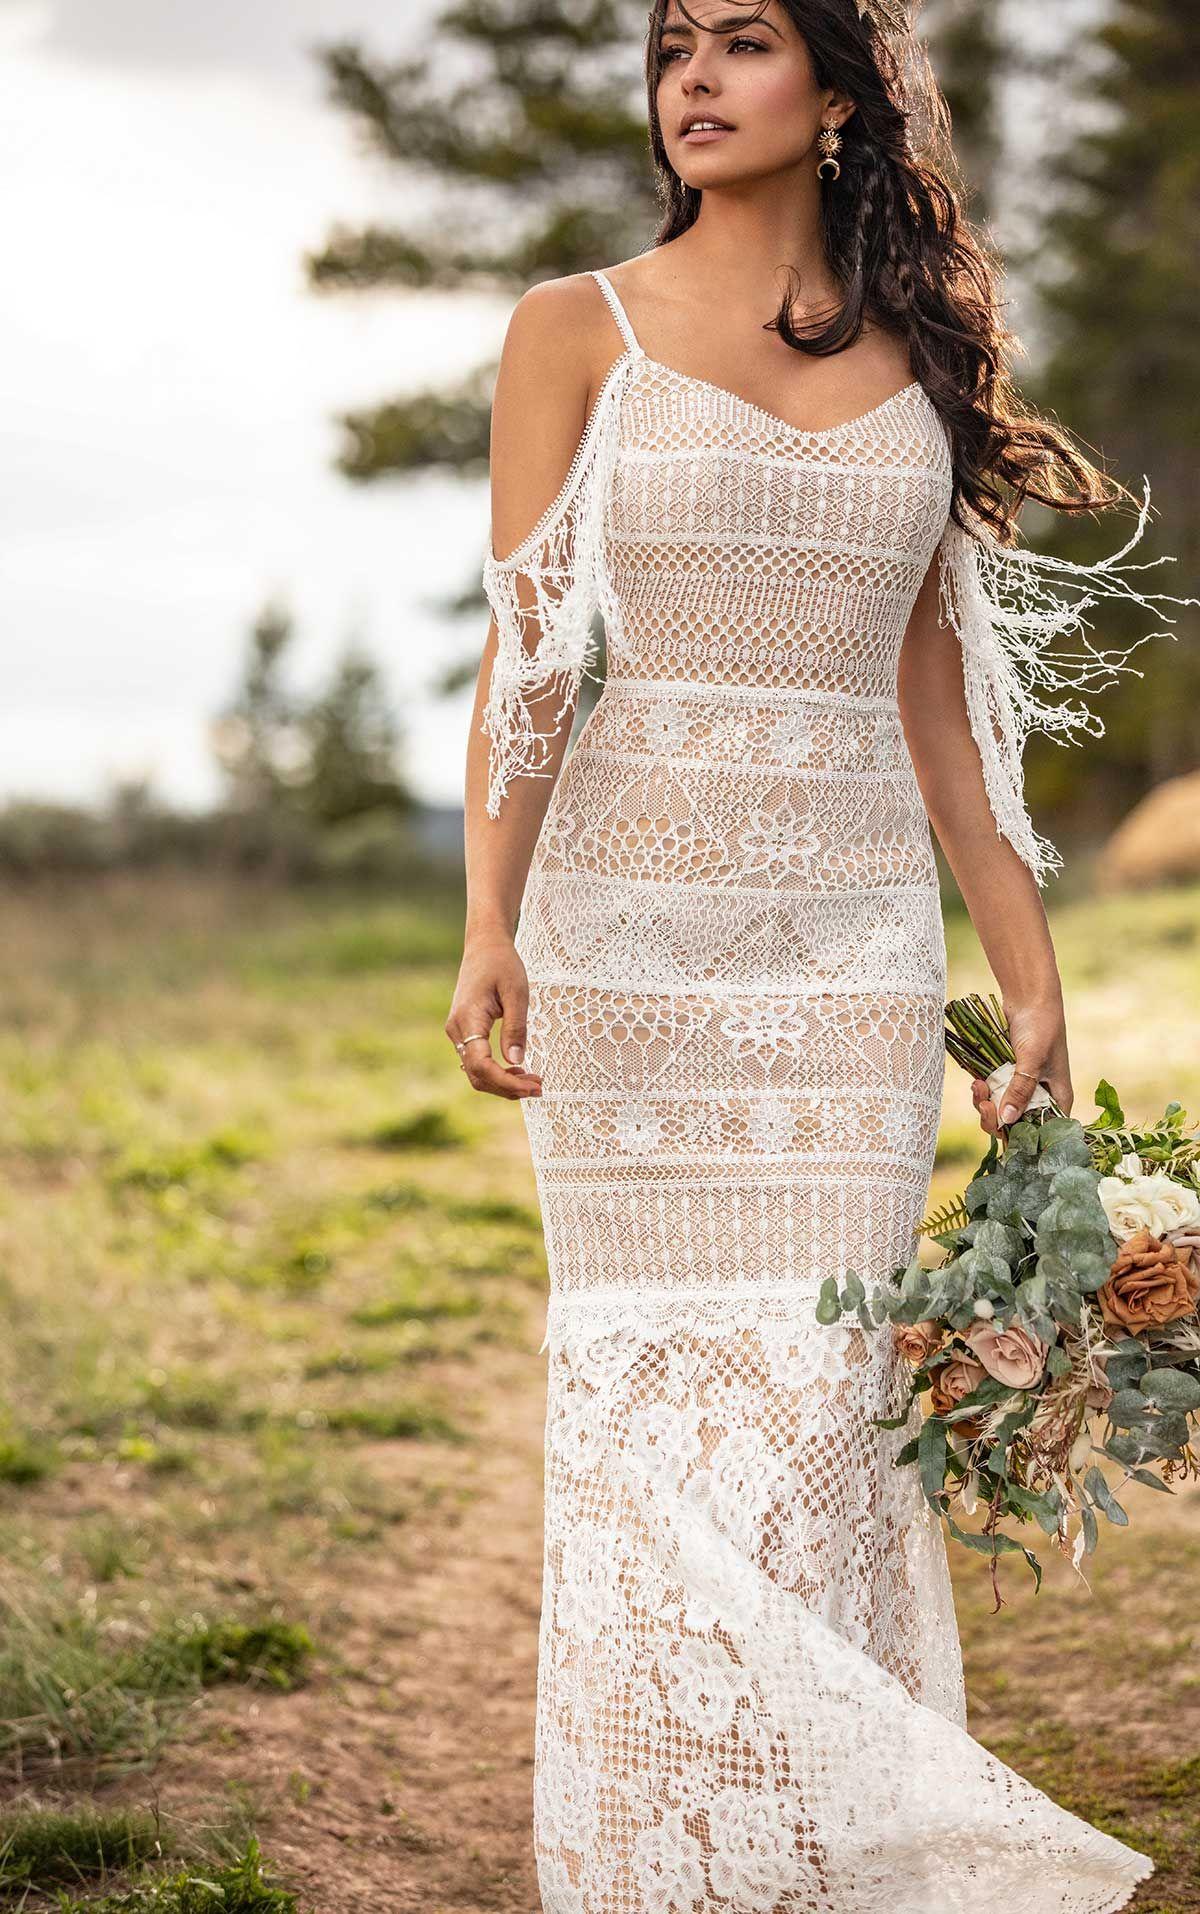 Unique Boho Lace Wedding Dress All Who Wander Chic Wedding Dresses Boho Wedding Dress Lace Bohemian Chic Weddings [ 1914 x 1200 Pixel ]